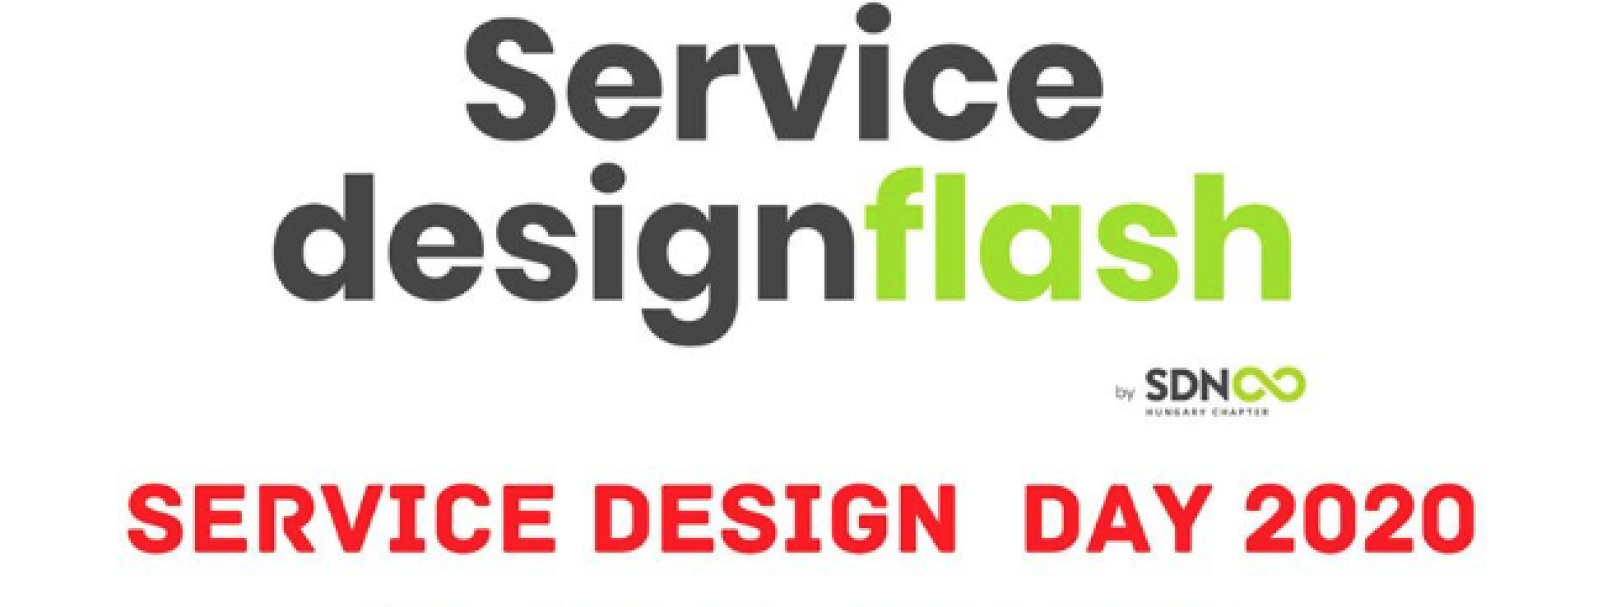 Service designflash - Service Design Day 2020